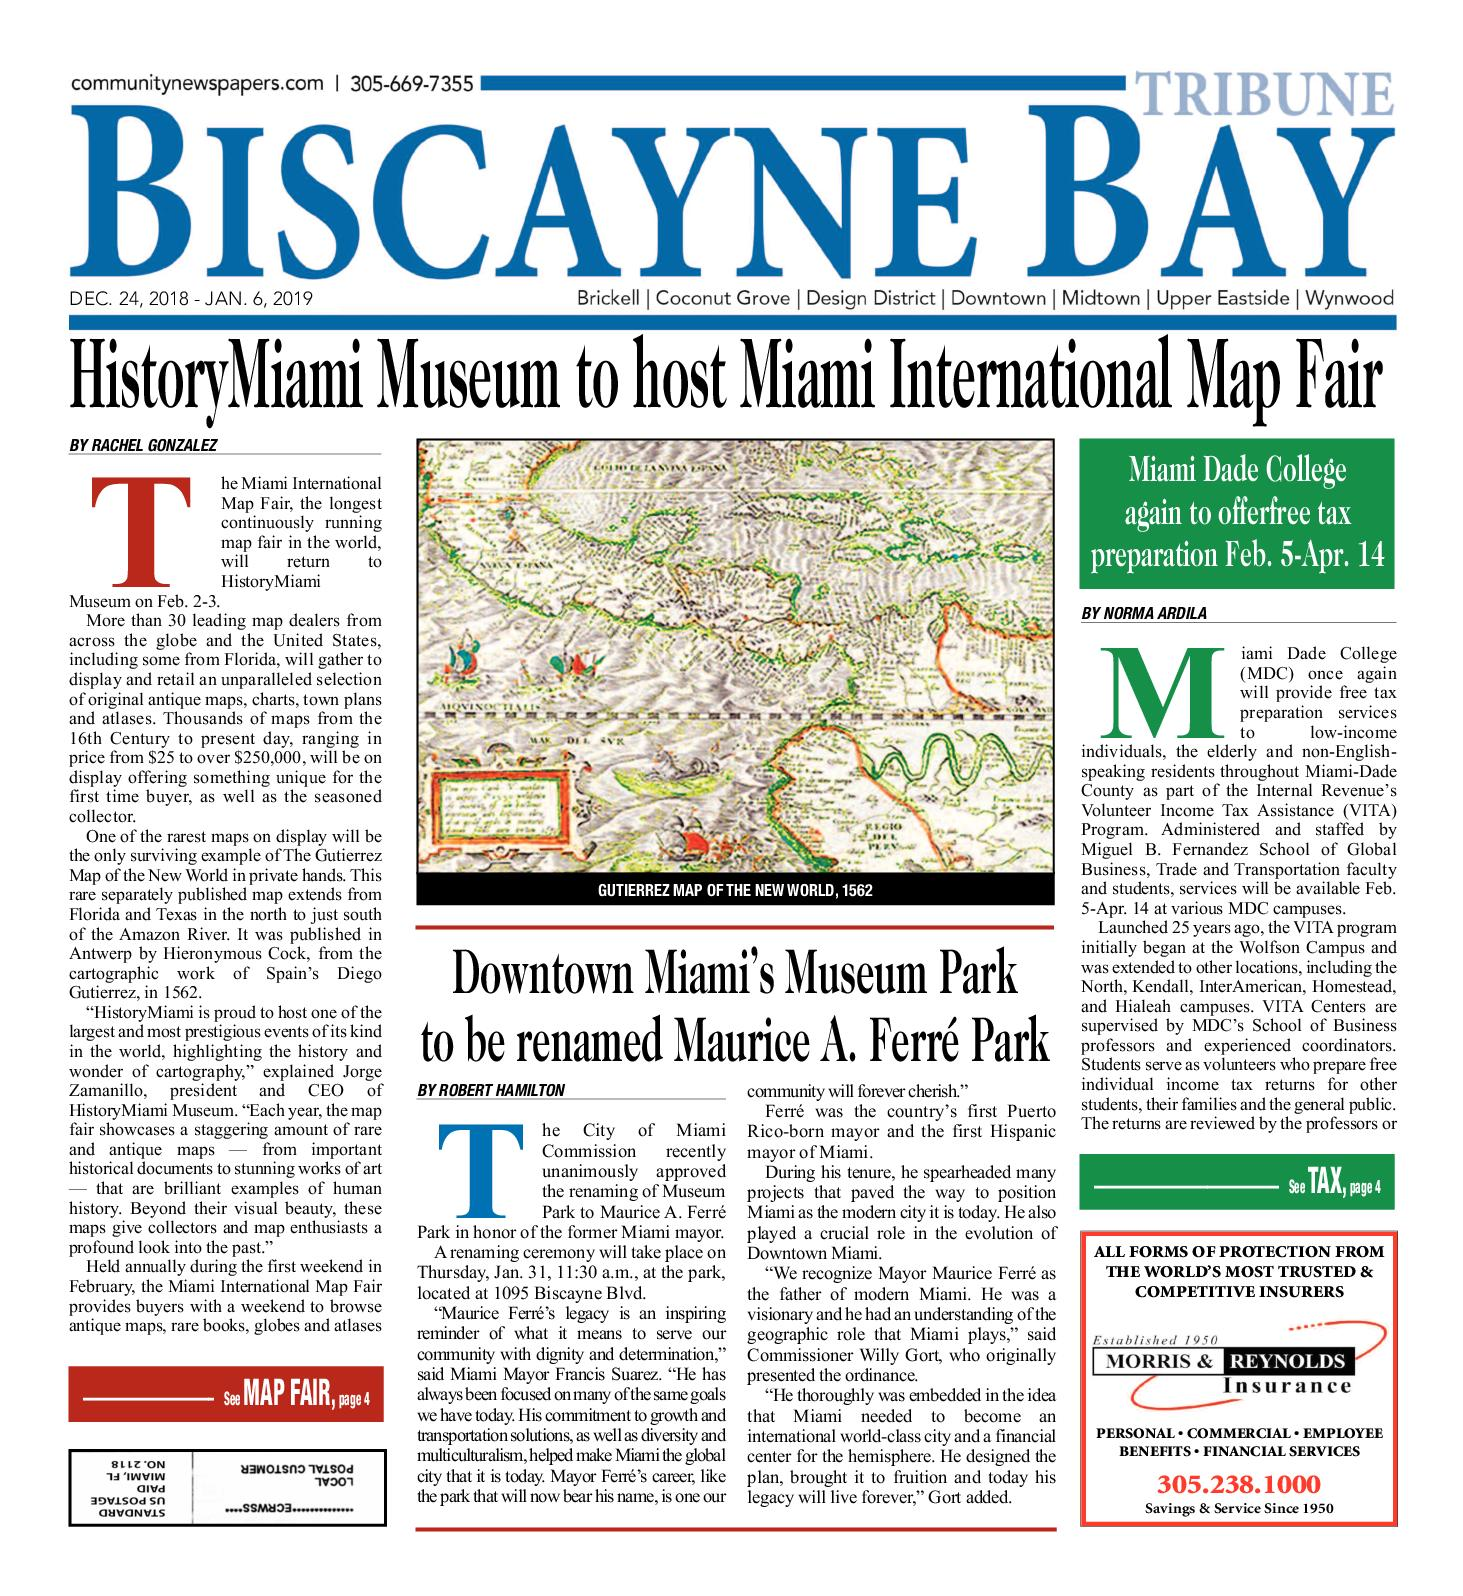 Calaméo - Biscayne Bay Tribune 12 24 2018